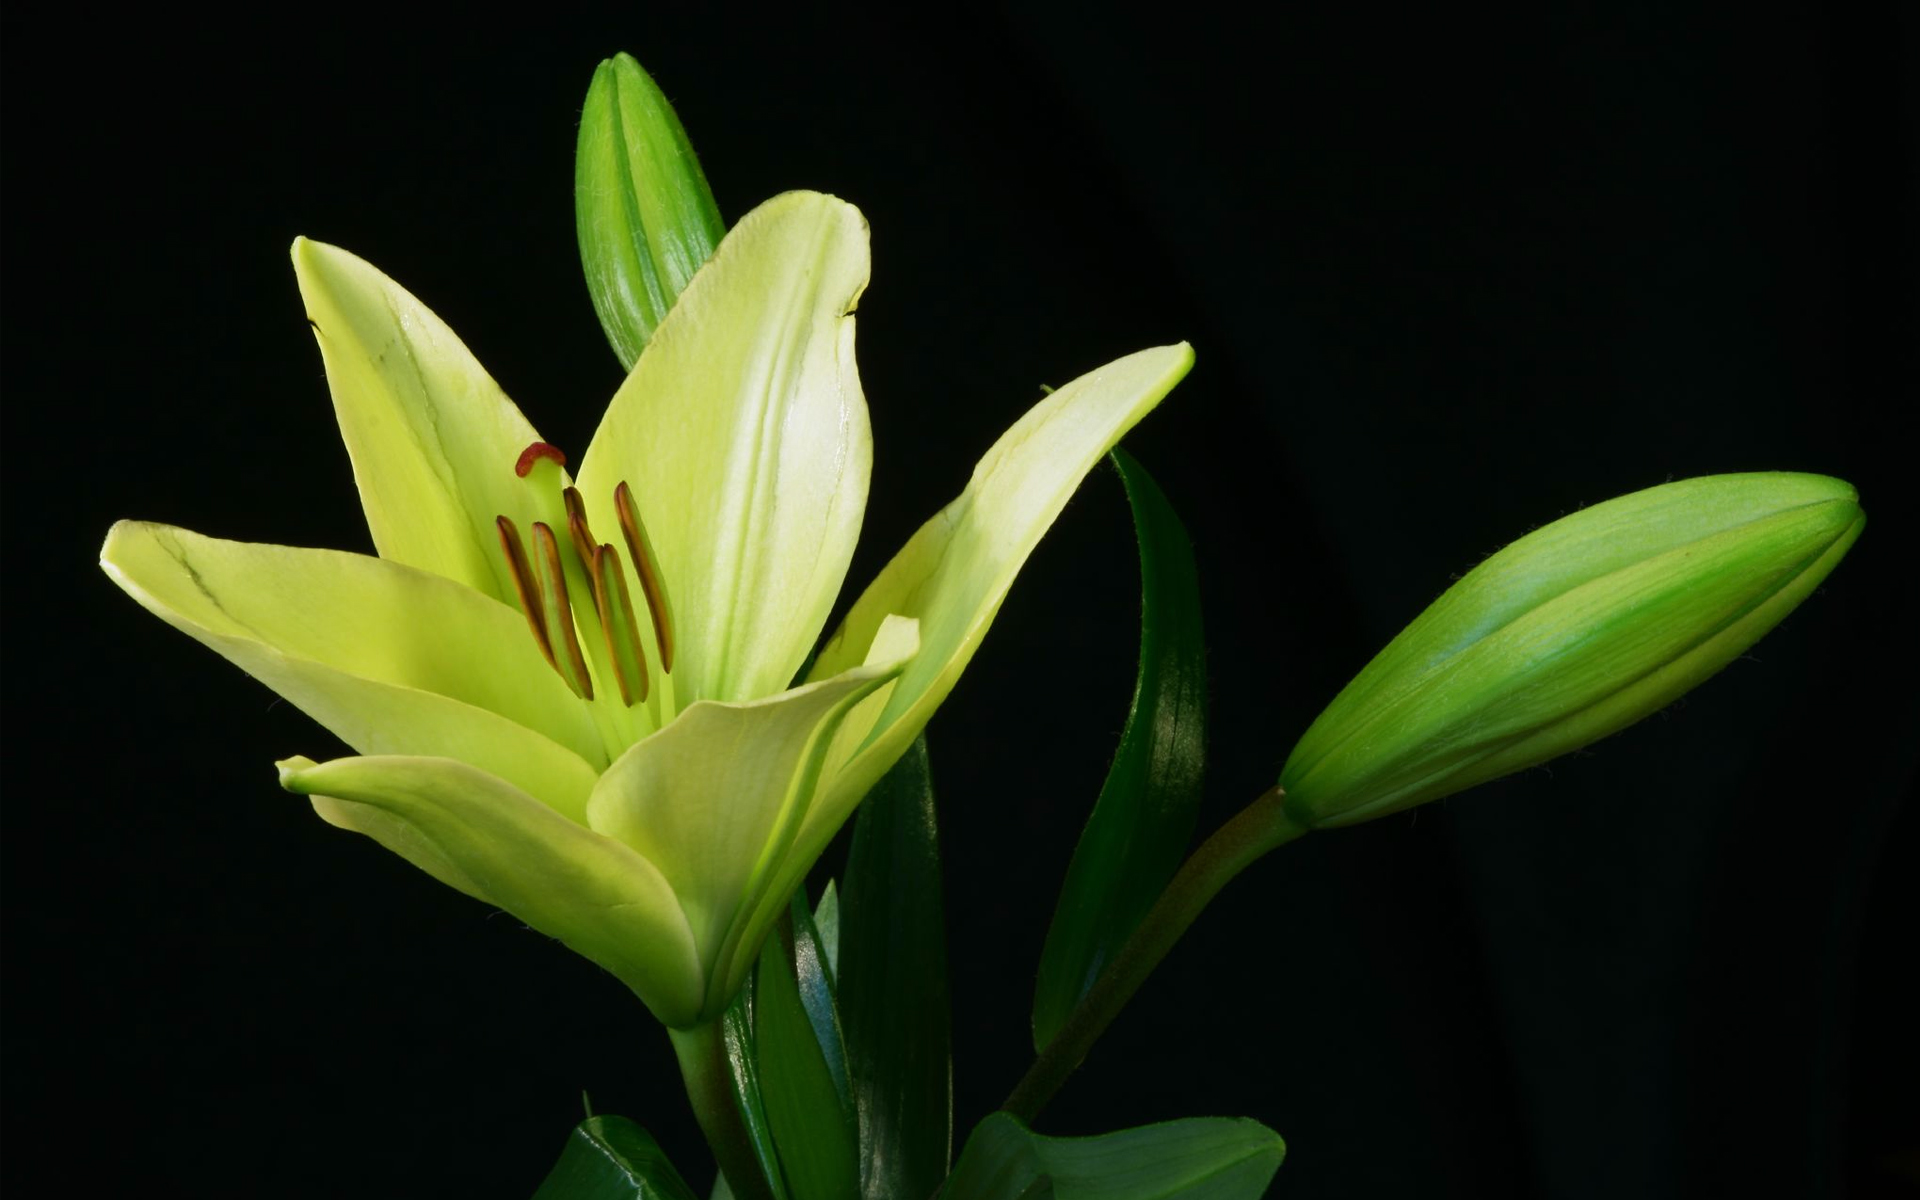 Green Flower Backgrounds #6967651